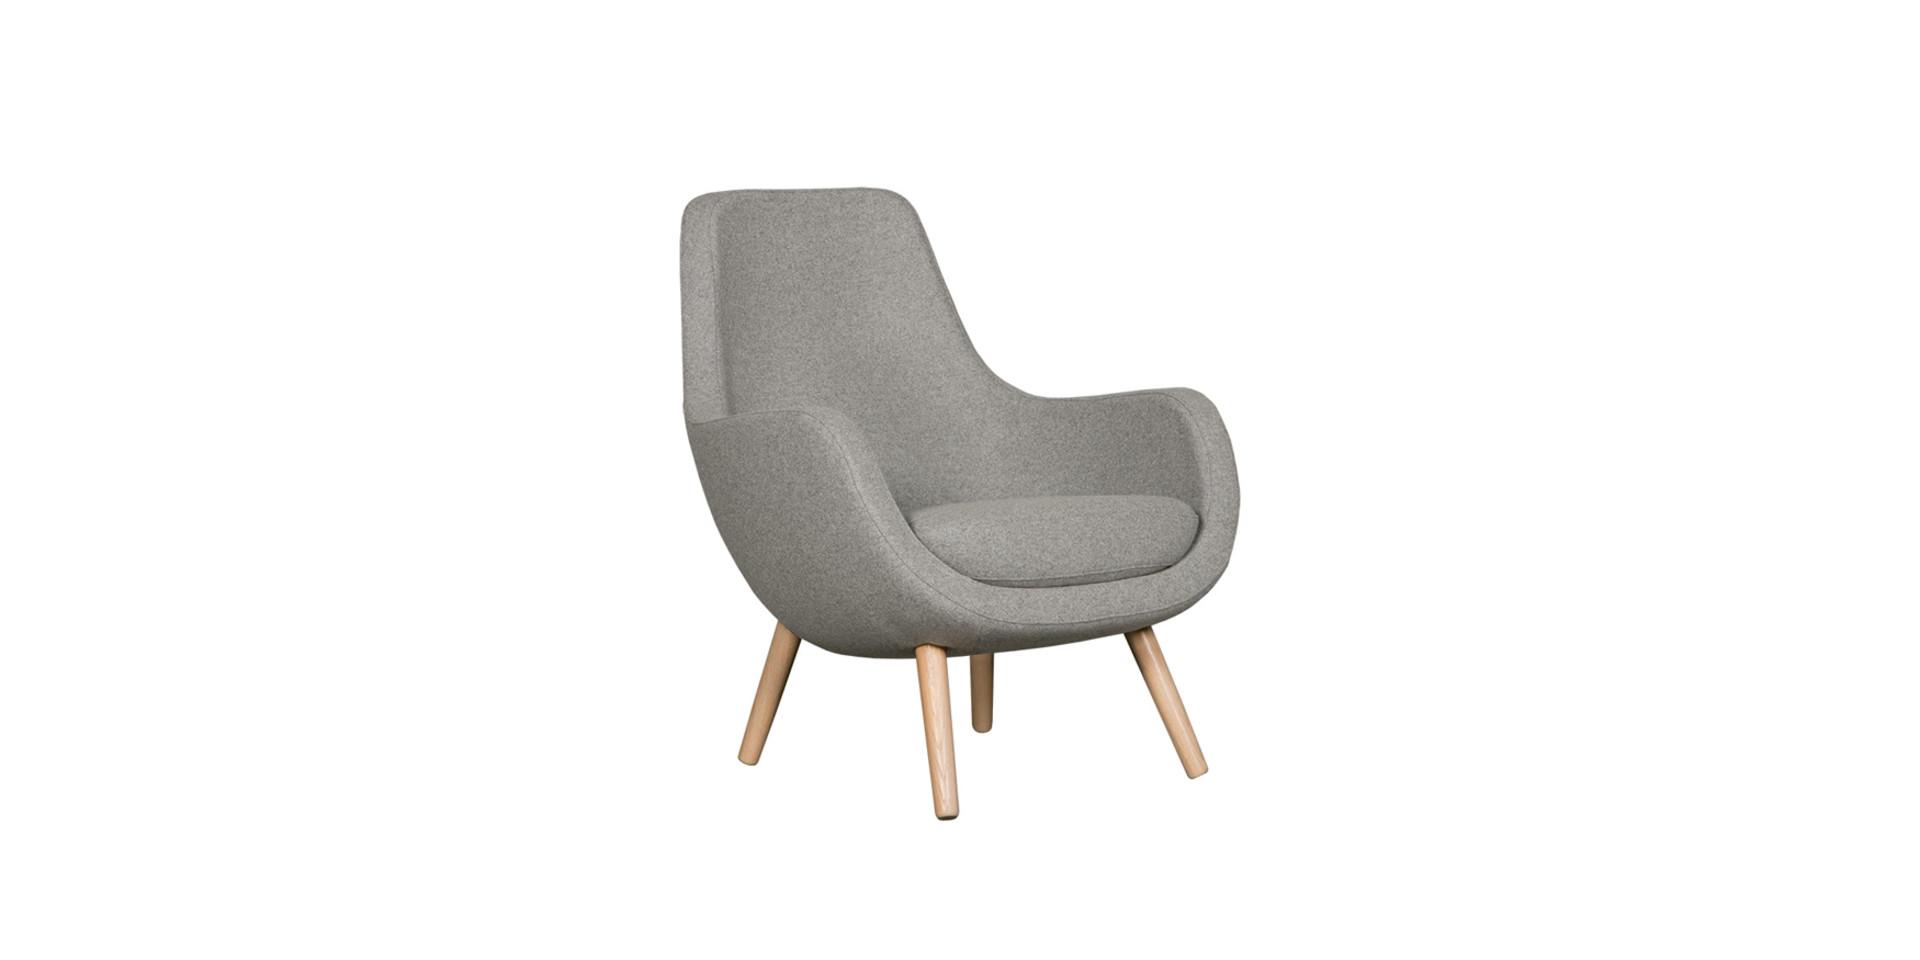 STEFANI_armchair_panno1000_light_grey_feet_oak_bleached_2